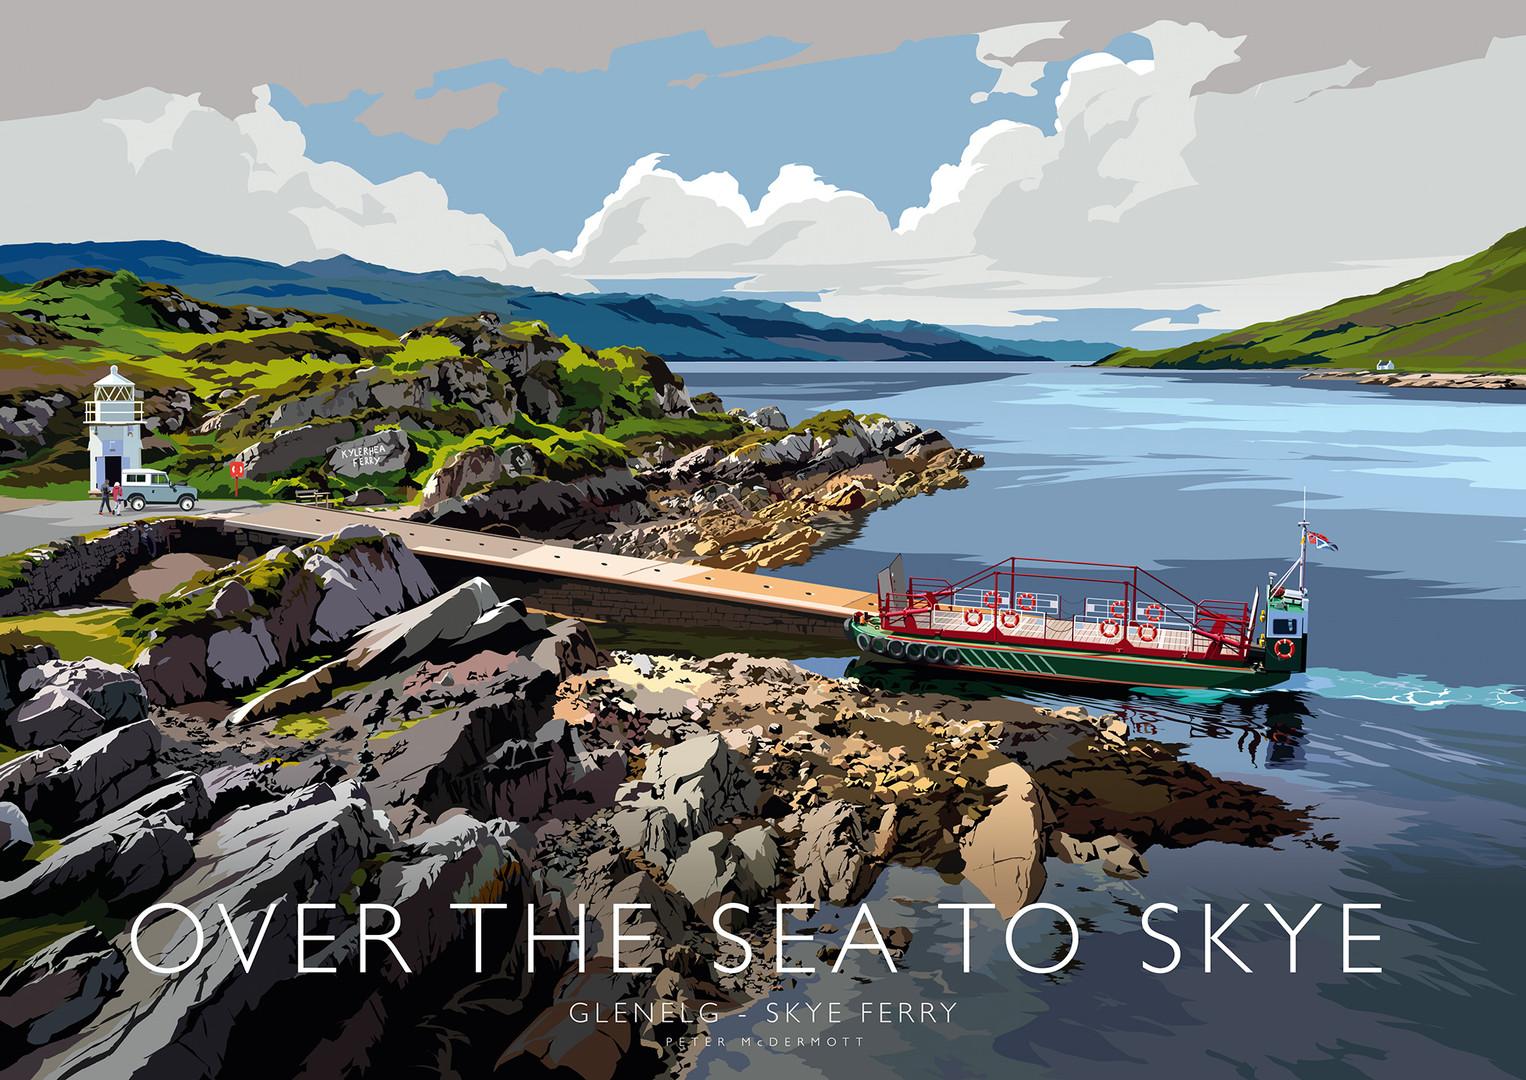 Over the sea to Skye